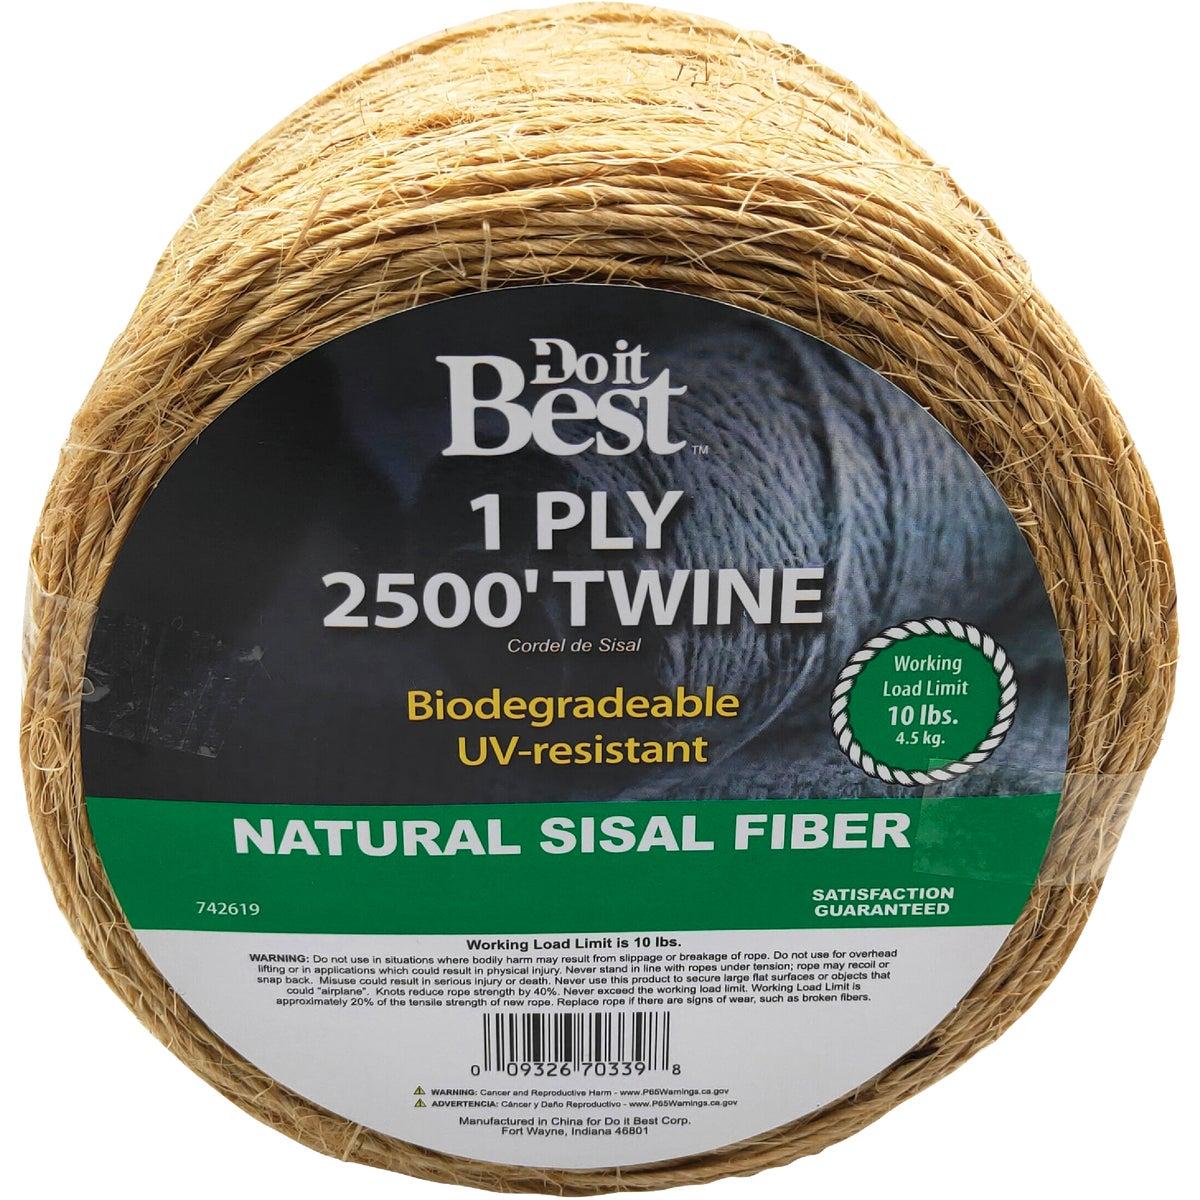 2500' 1PLY SISAL TWINE